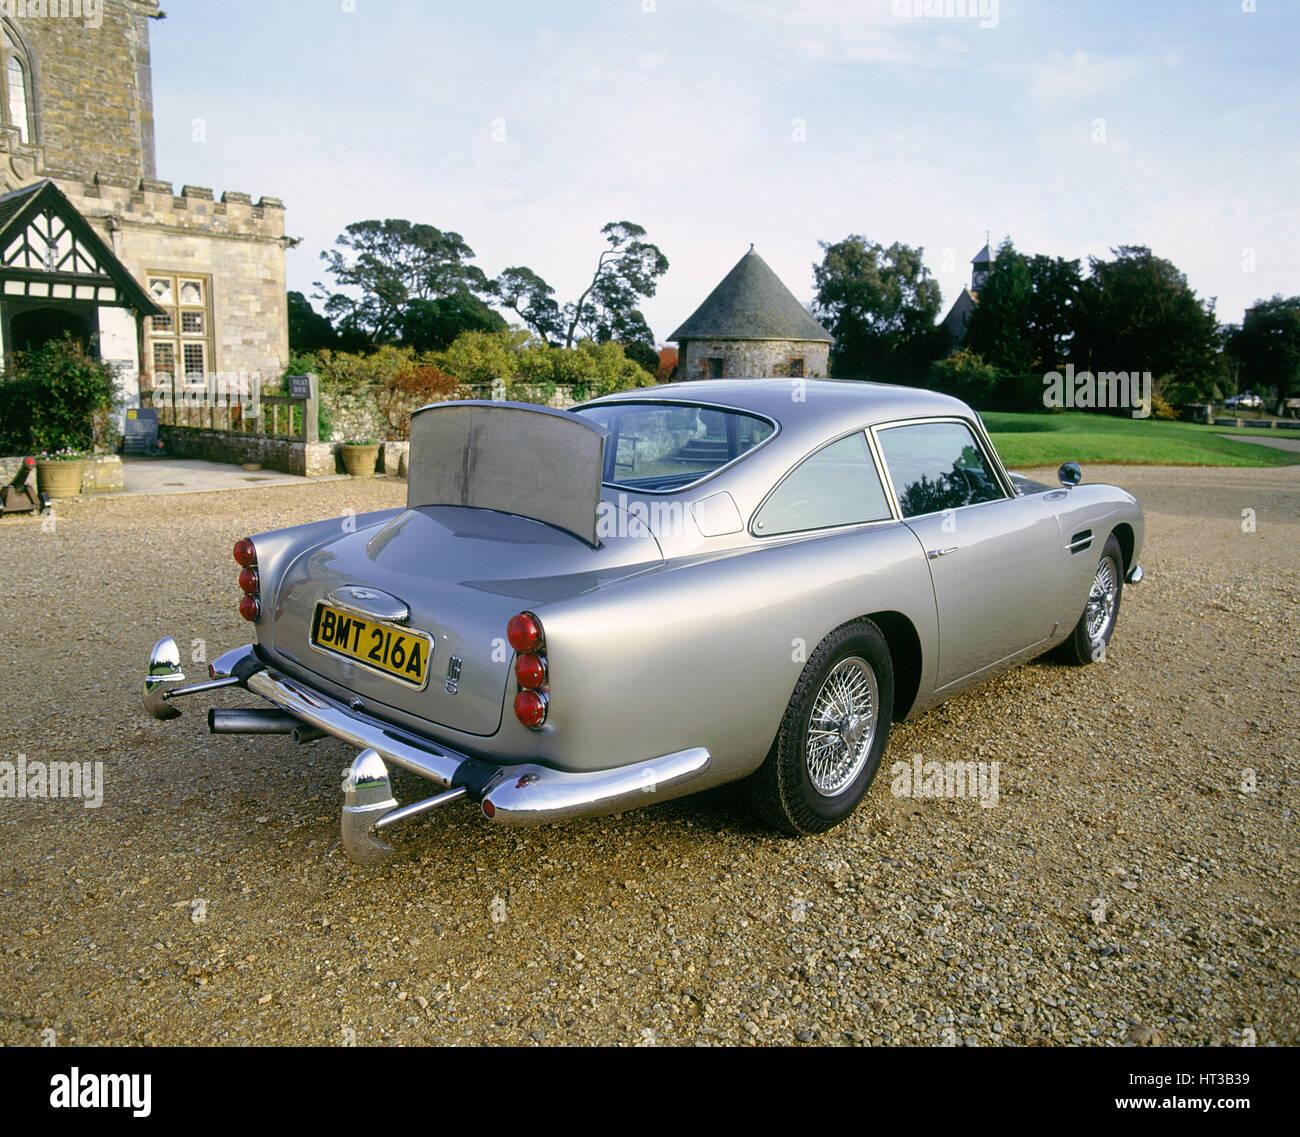 1965 Aston Martin DB5, James Bond 007. Artista: sconosciuto. Immagini Stock